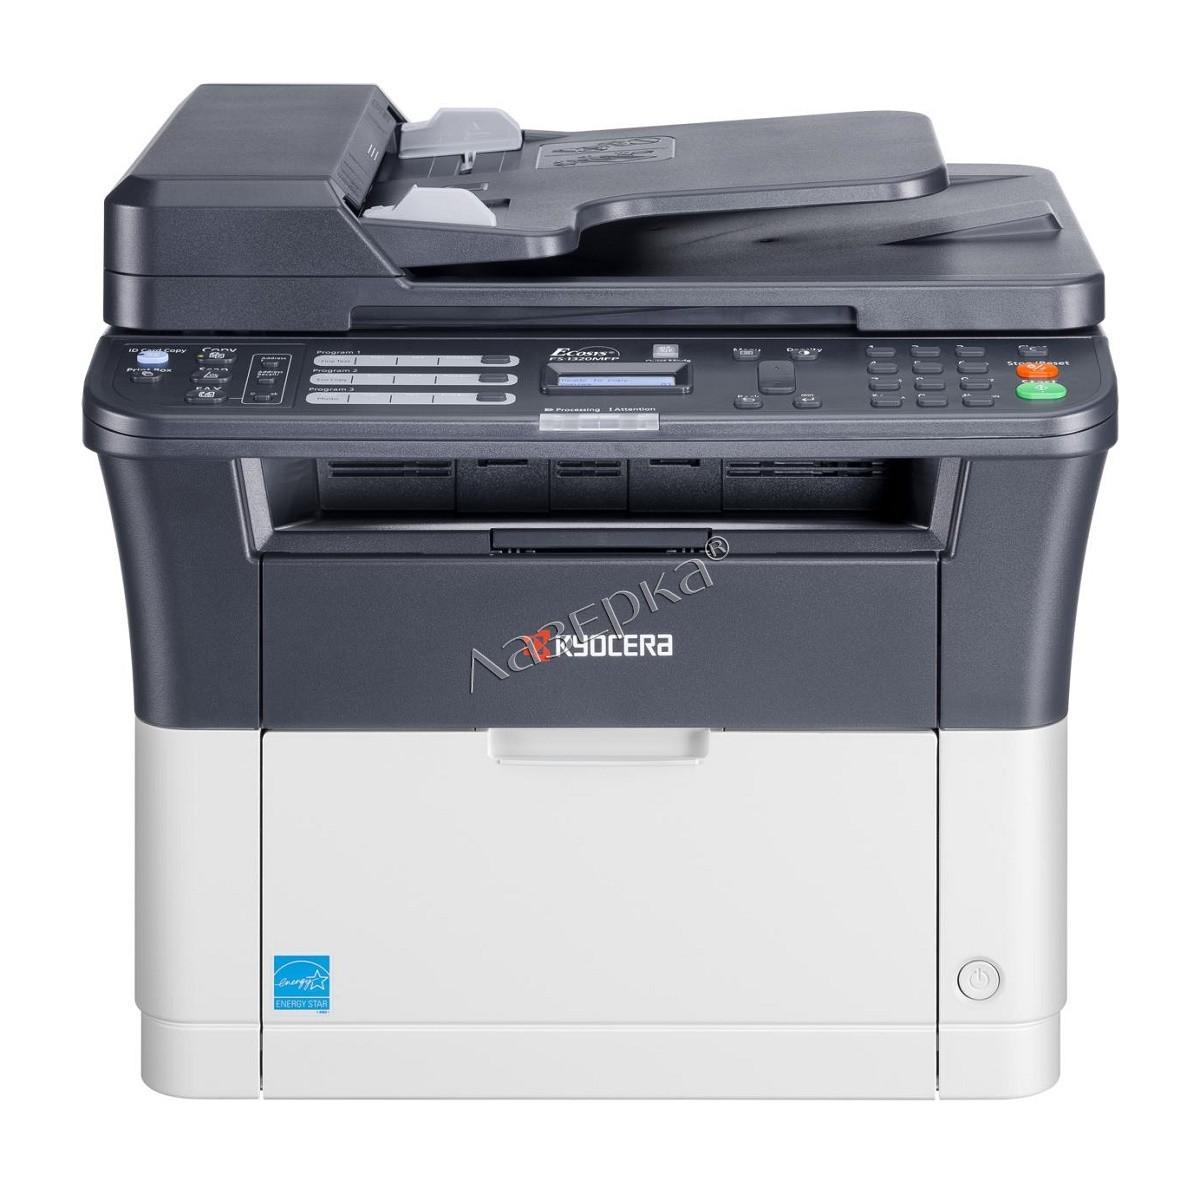 Kyocera Fs 1120 Mfp Printer Driver Download